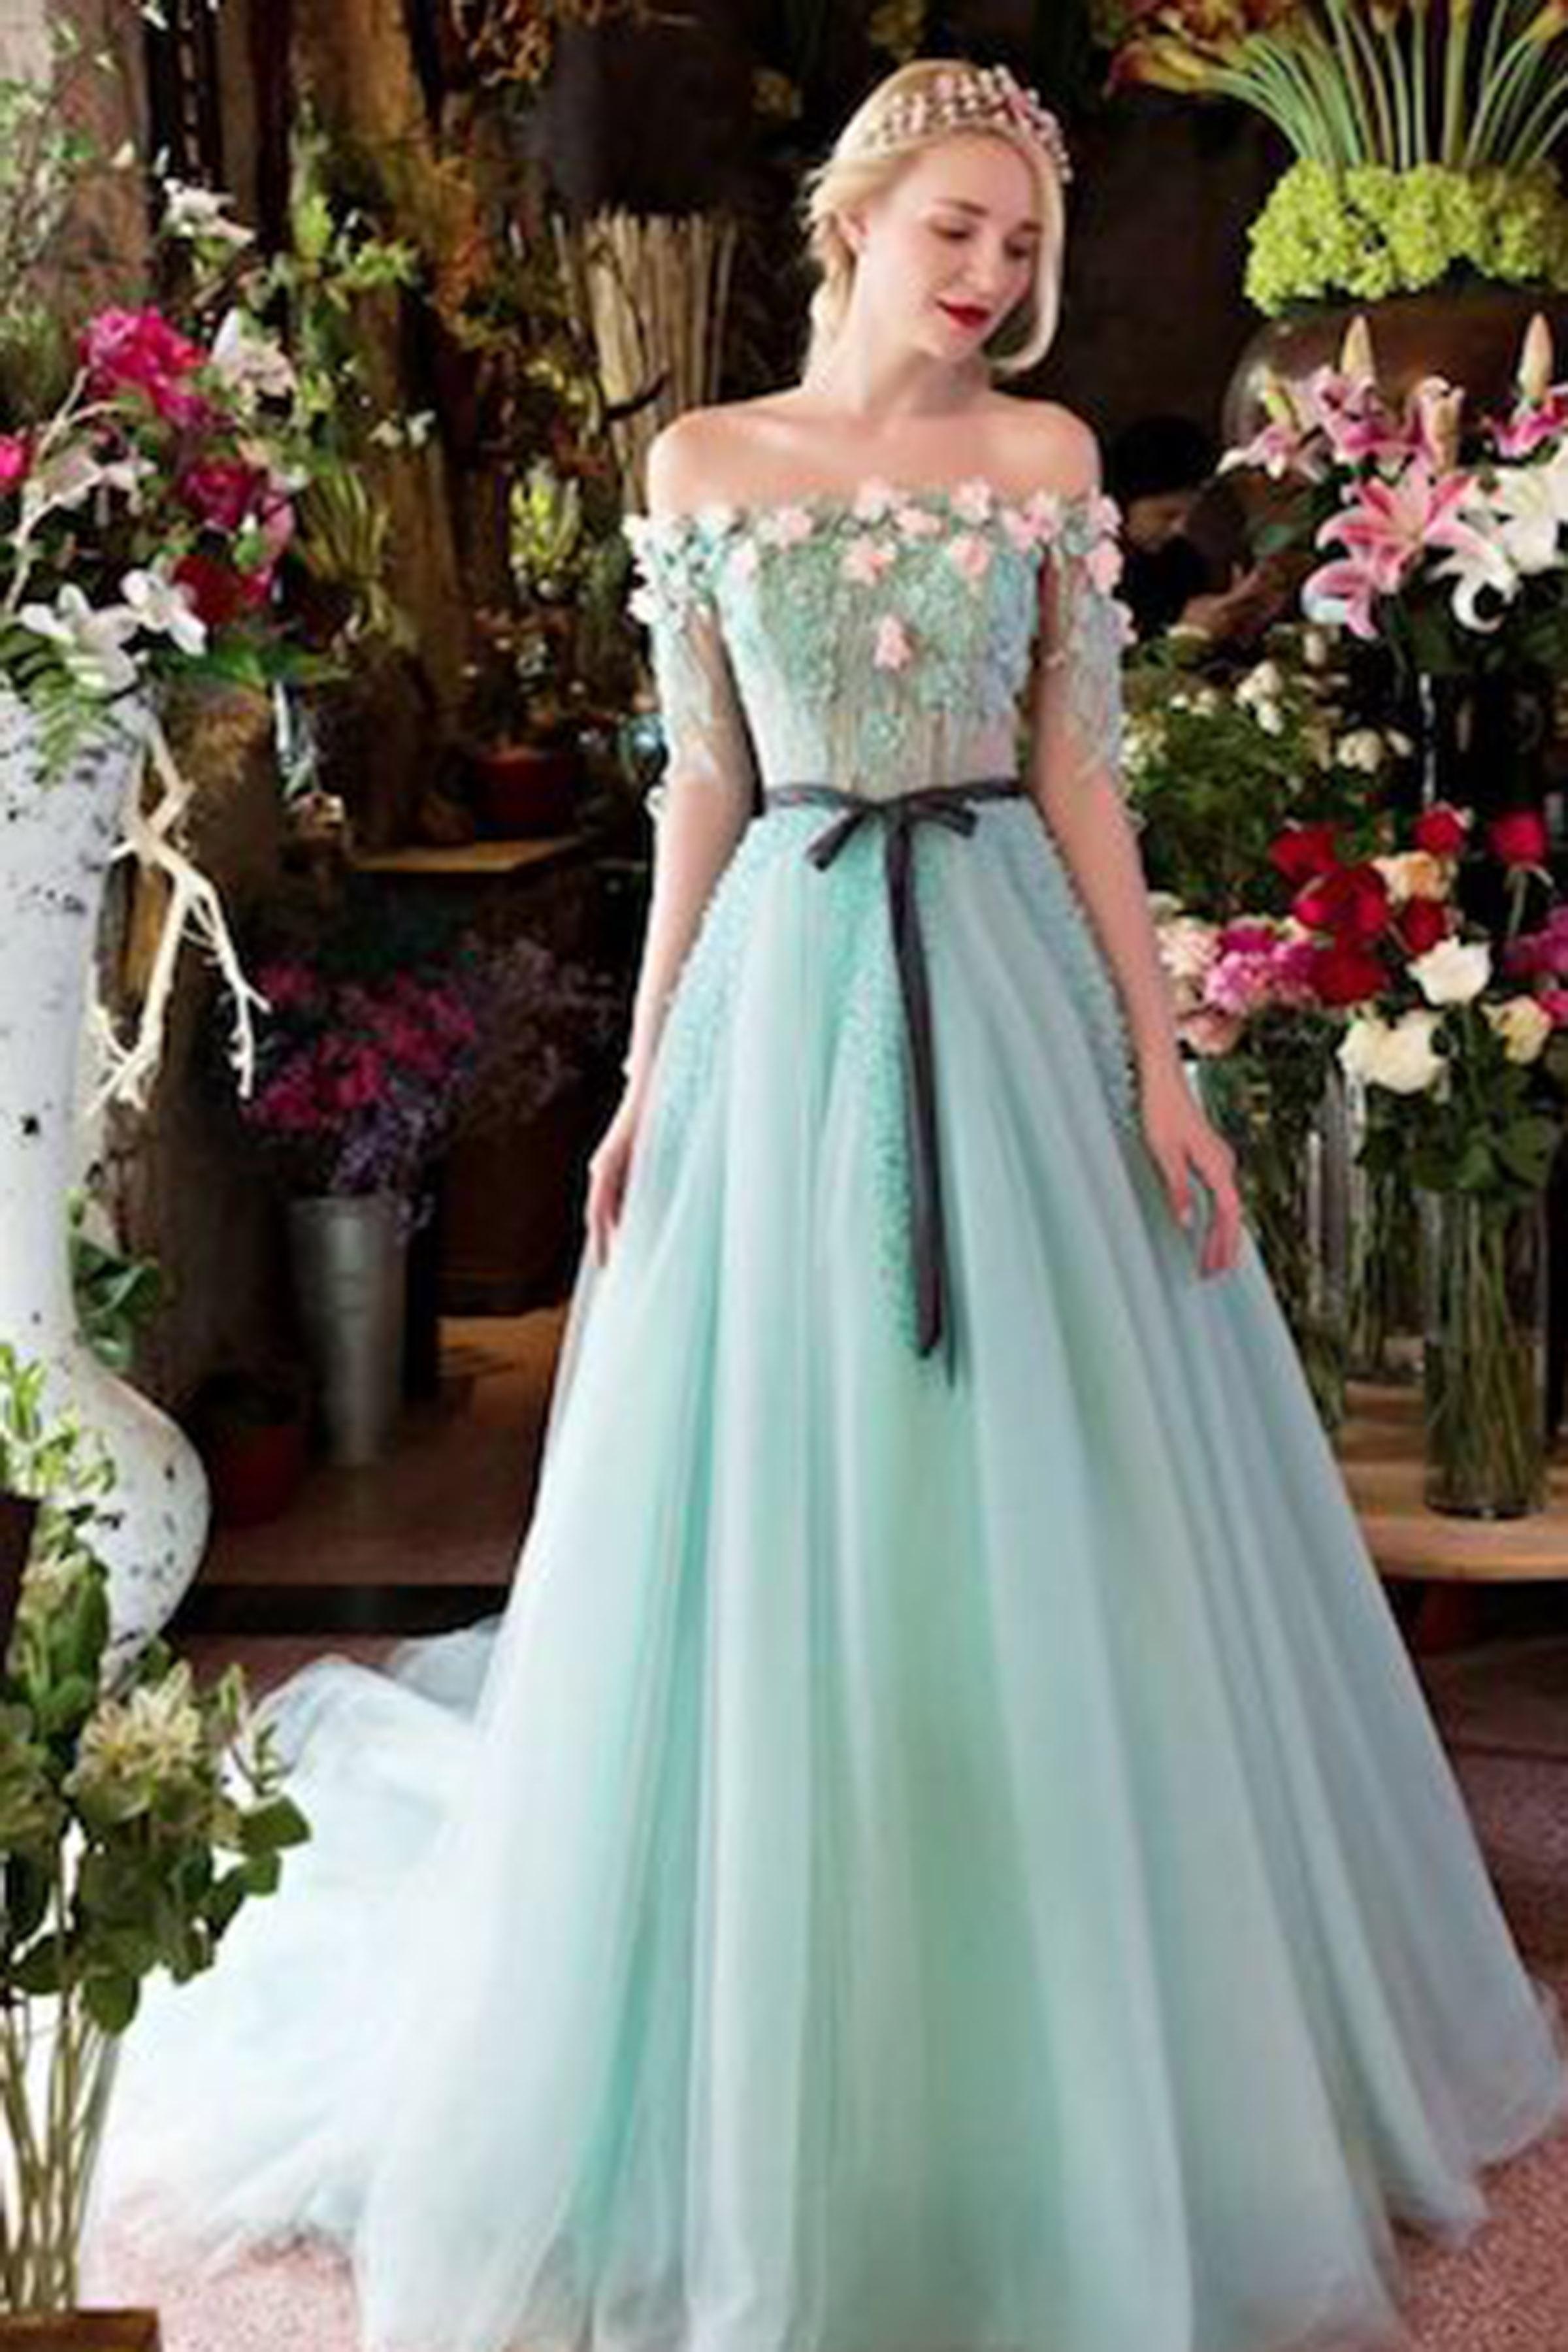 Gallant Mint Organza Short Sleeves Handmade Flower Long Prom Mint Organza Short Sleeves Handmade Flower Long Prom Long Prom Dresses Blue Long Prom Dresses Sleeves wedding dress Long Prom Dresses